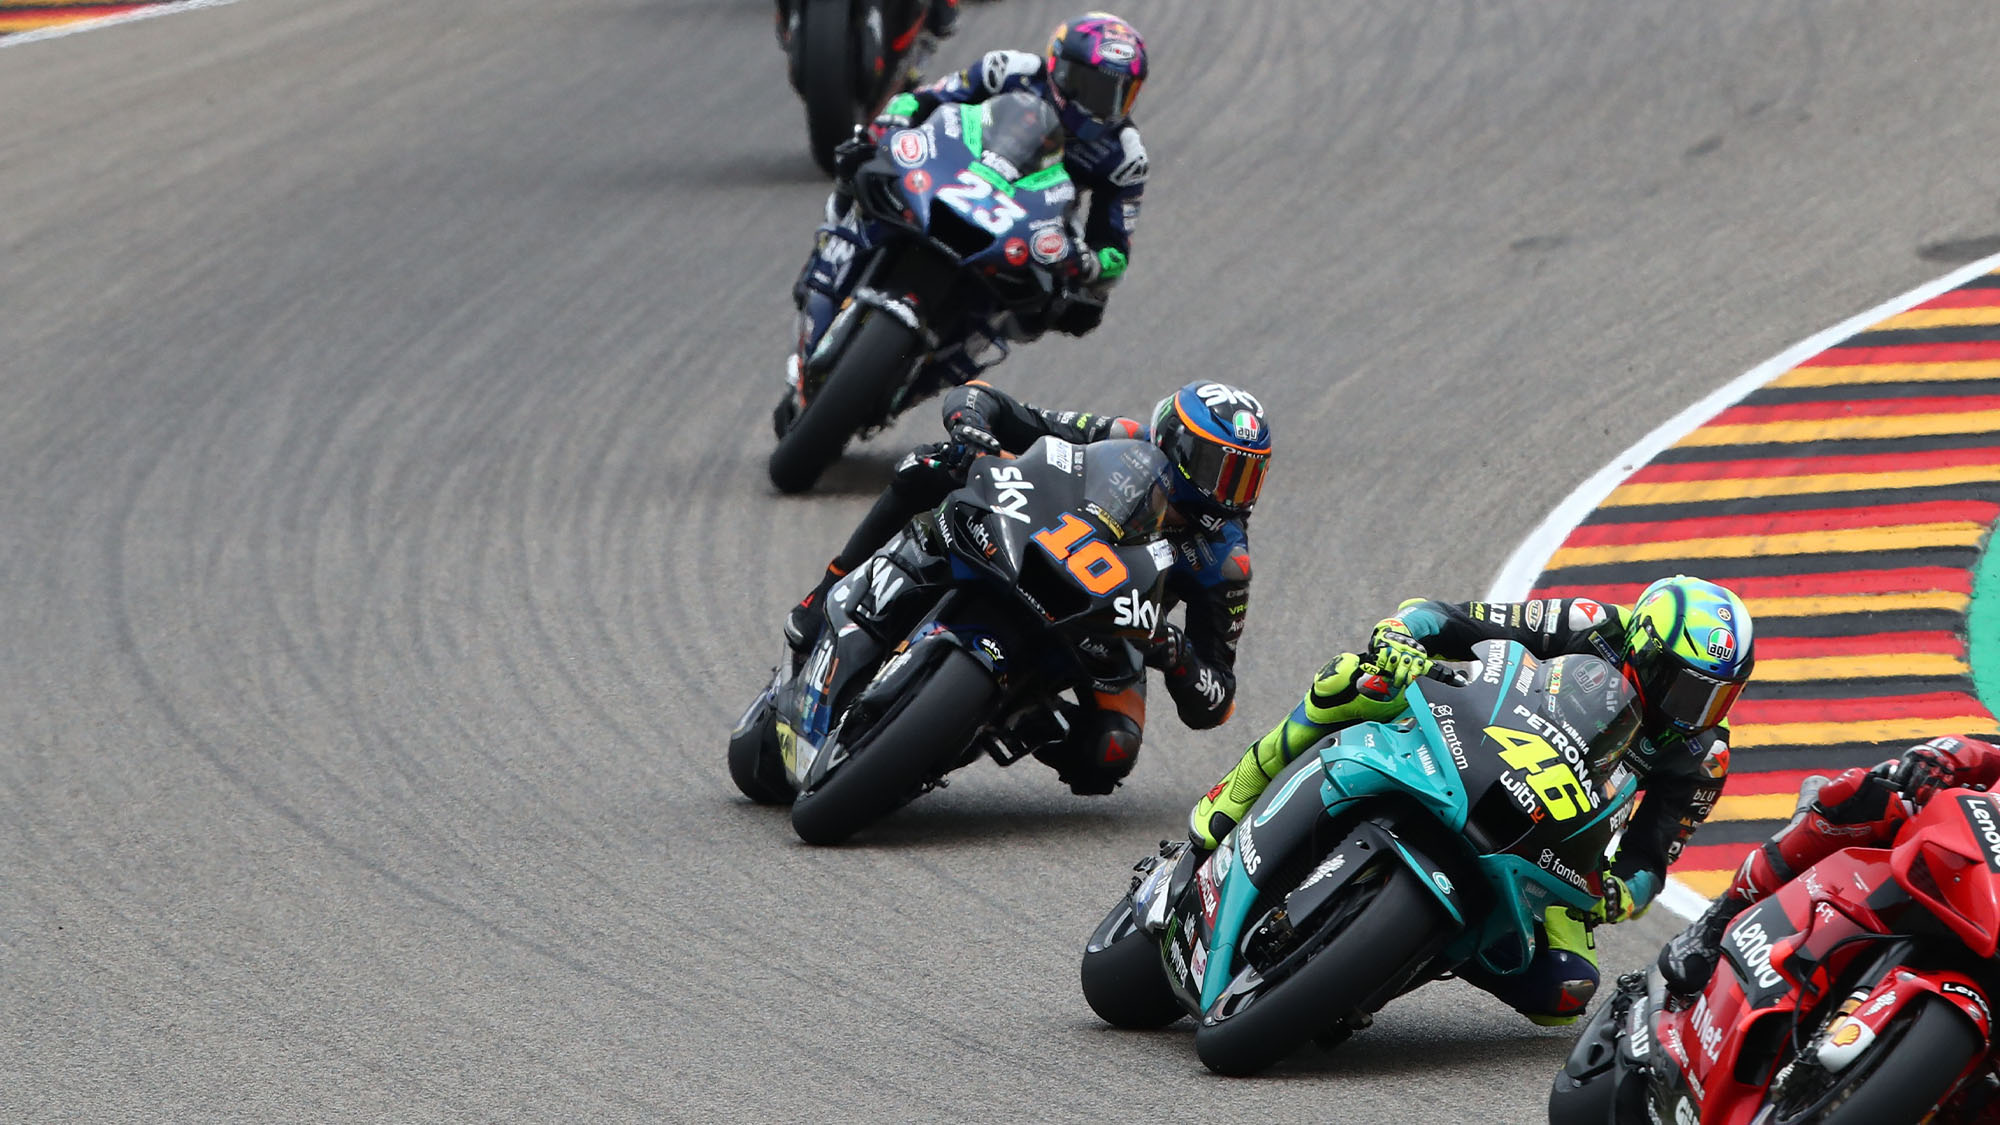 Valentino Rossi at the 2021 MotoGP German GP